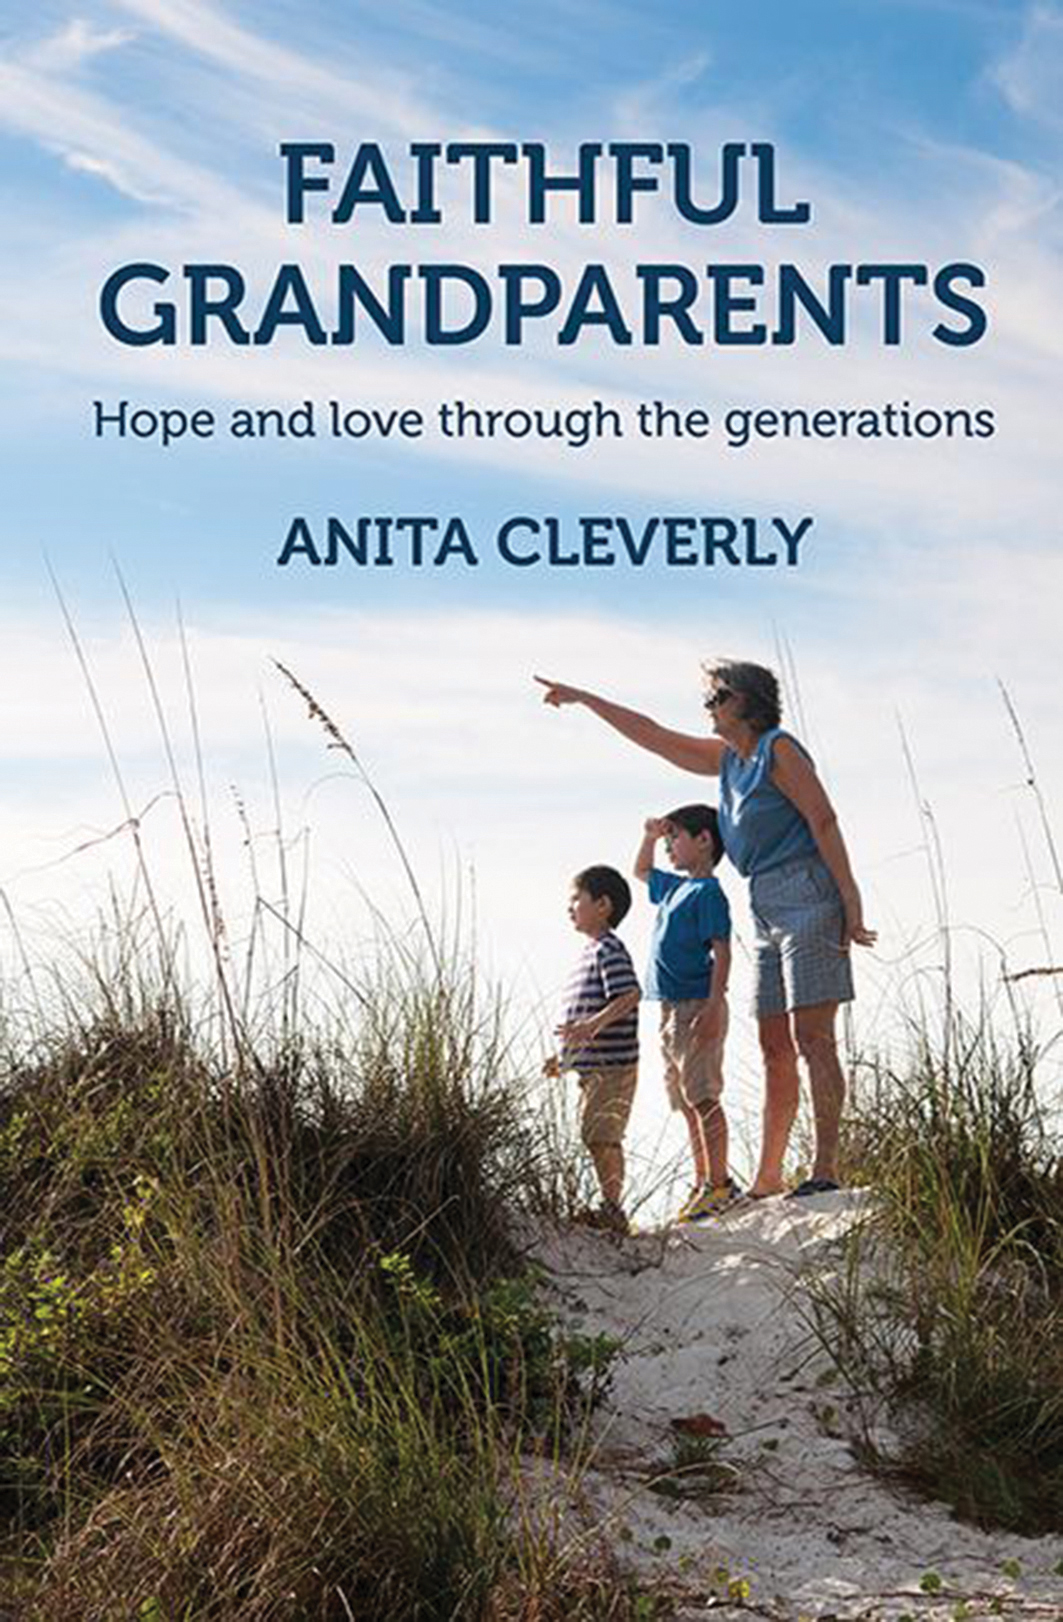 Faithful Grandparents